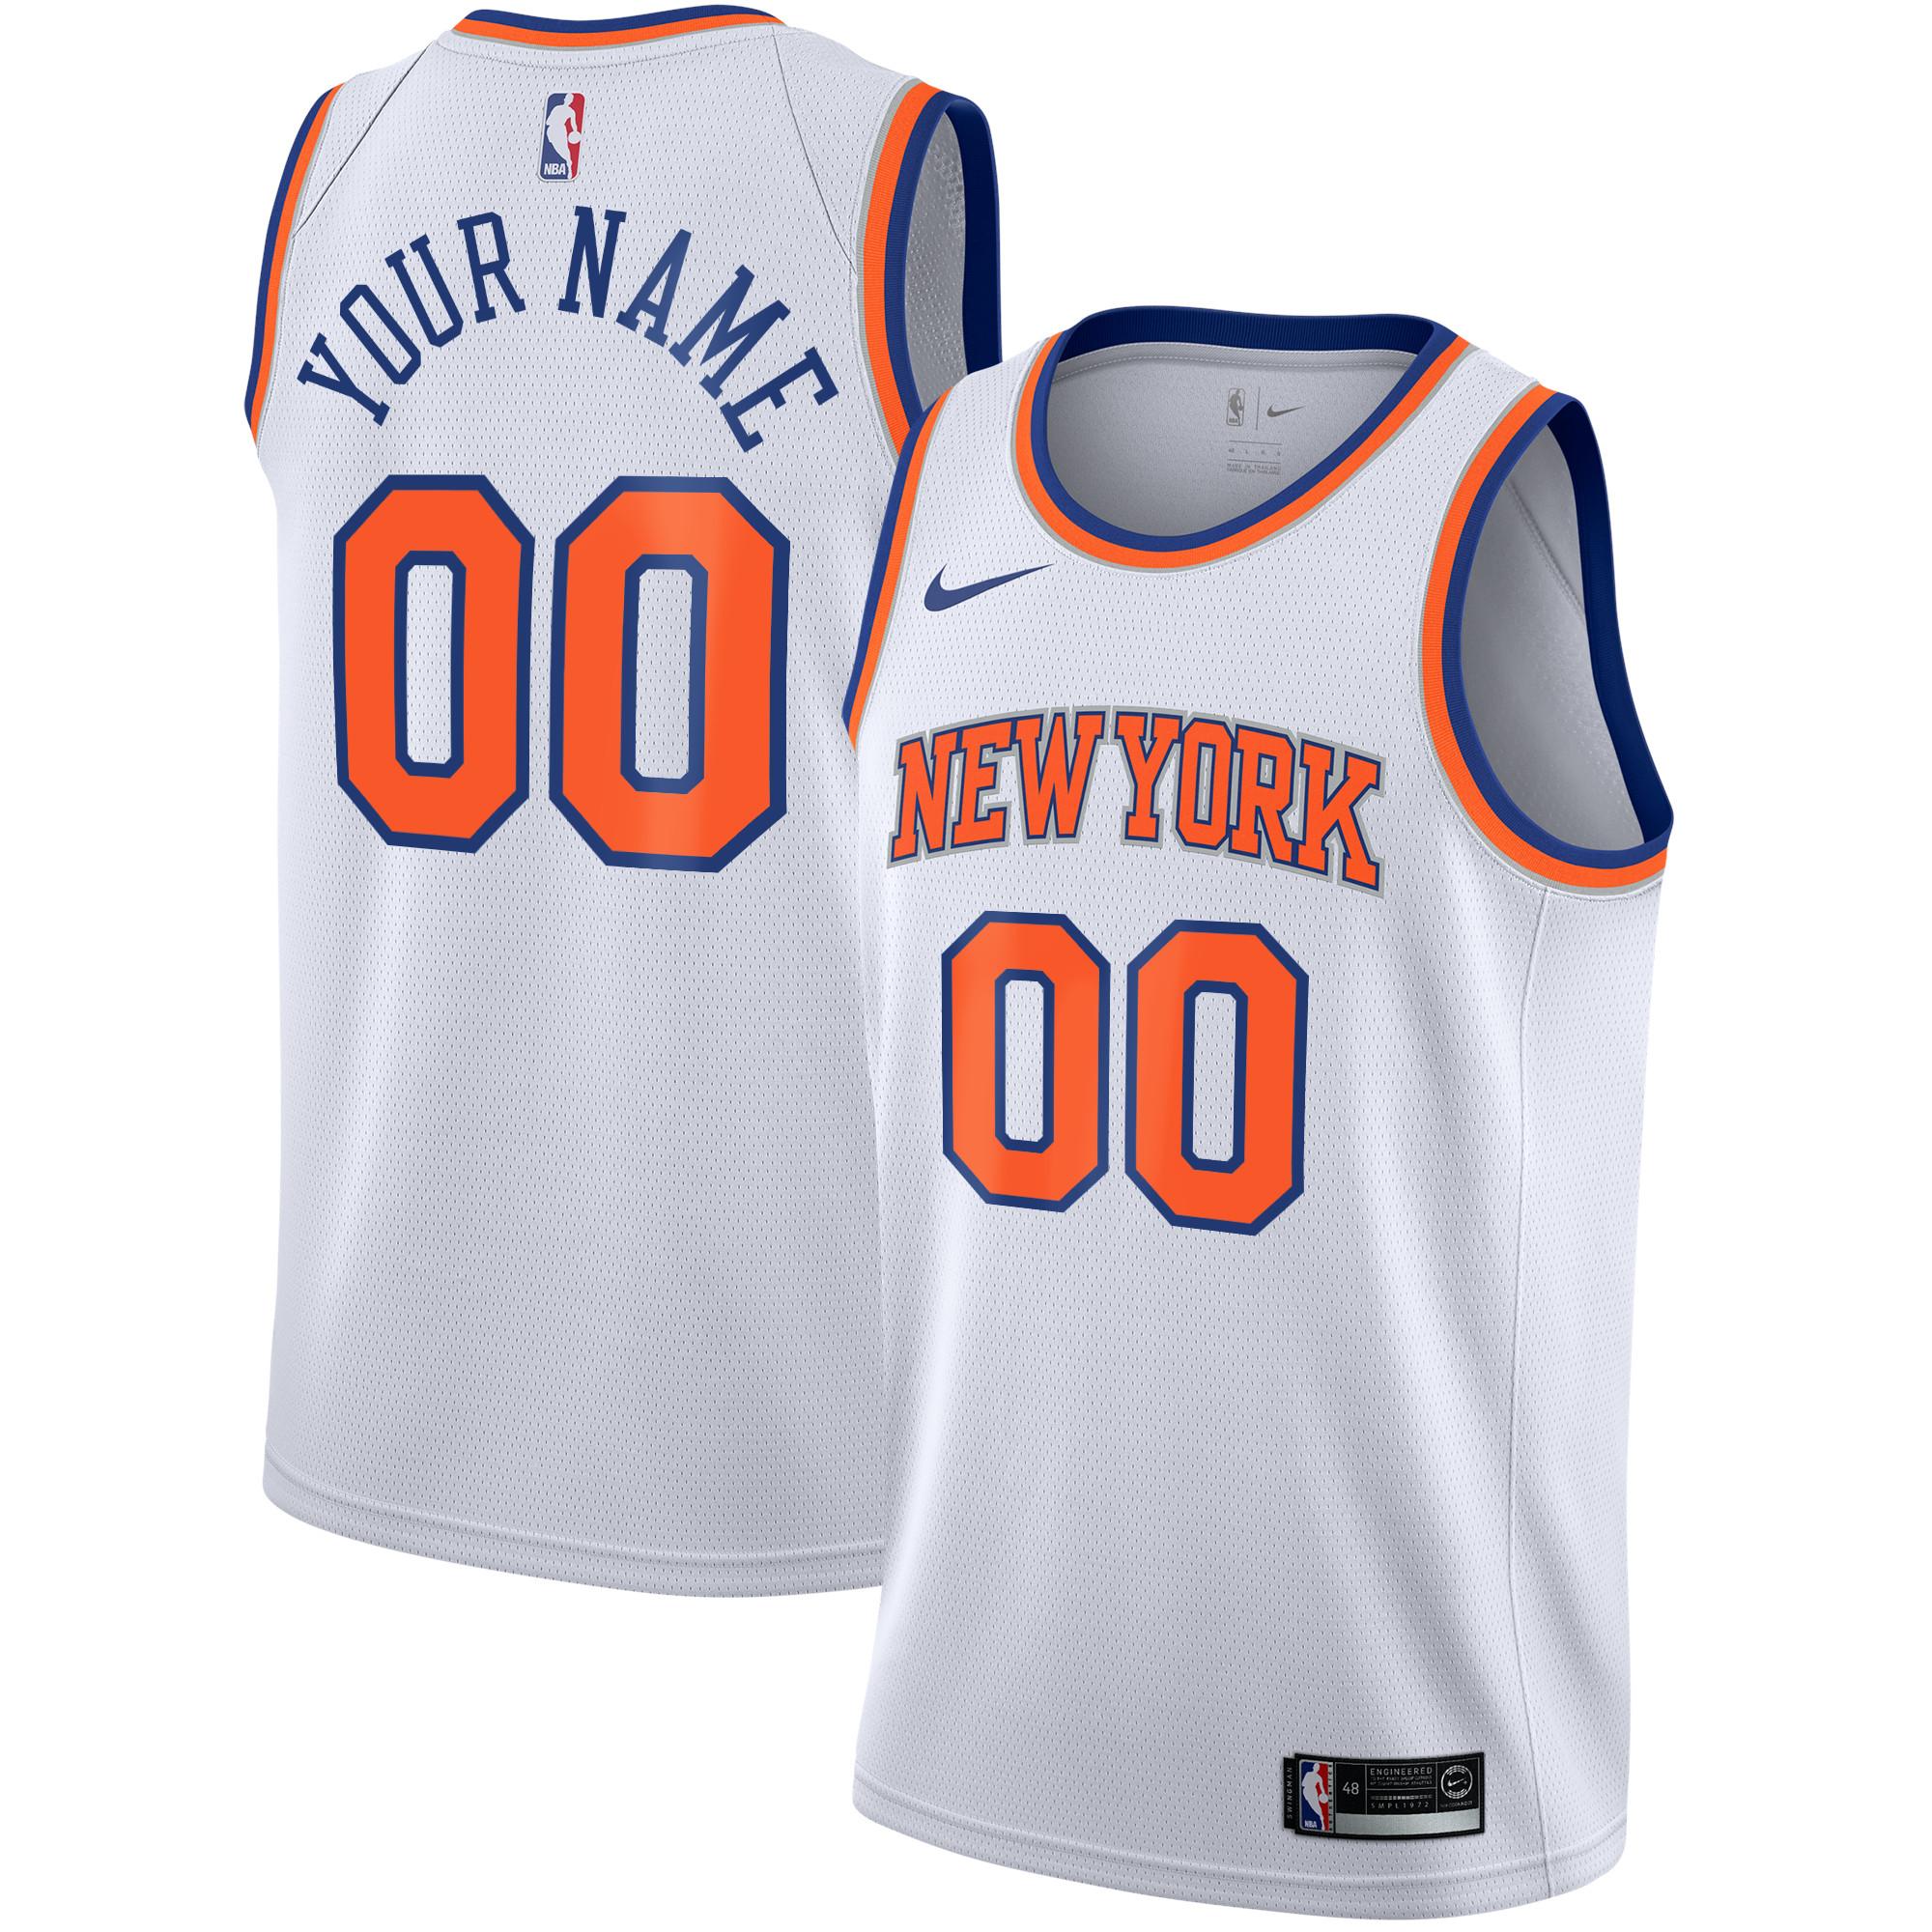 New York Knicks Nike Association Swingman Camiseta de la NBA - Custom - Adolescentes